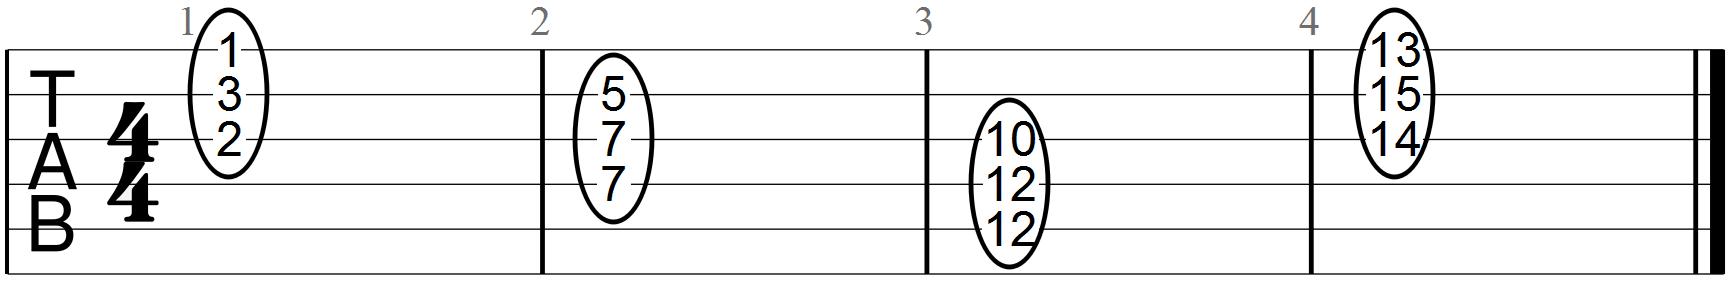 D Minor Chords Images Chord Guitar Finger Position